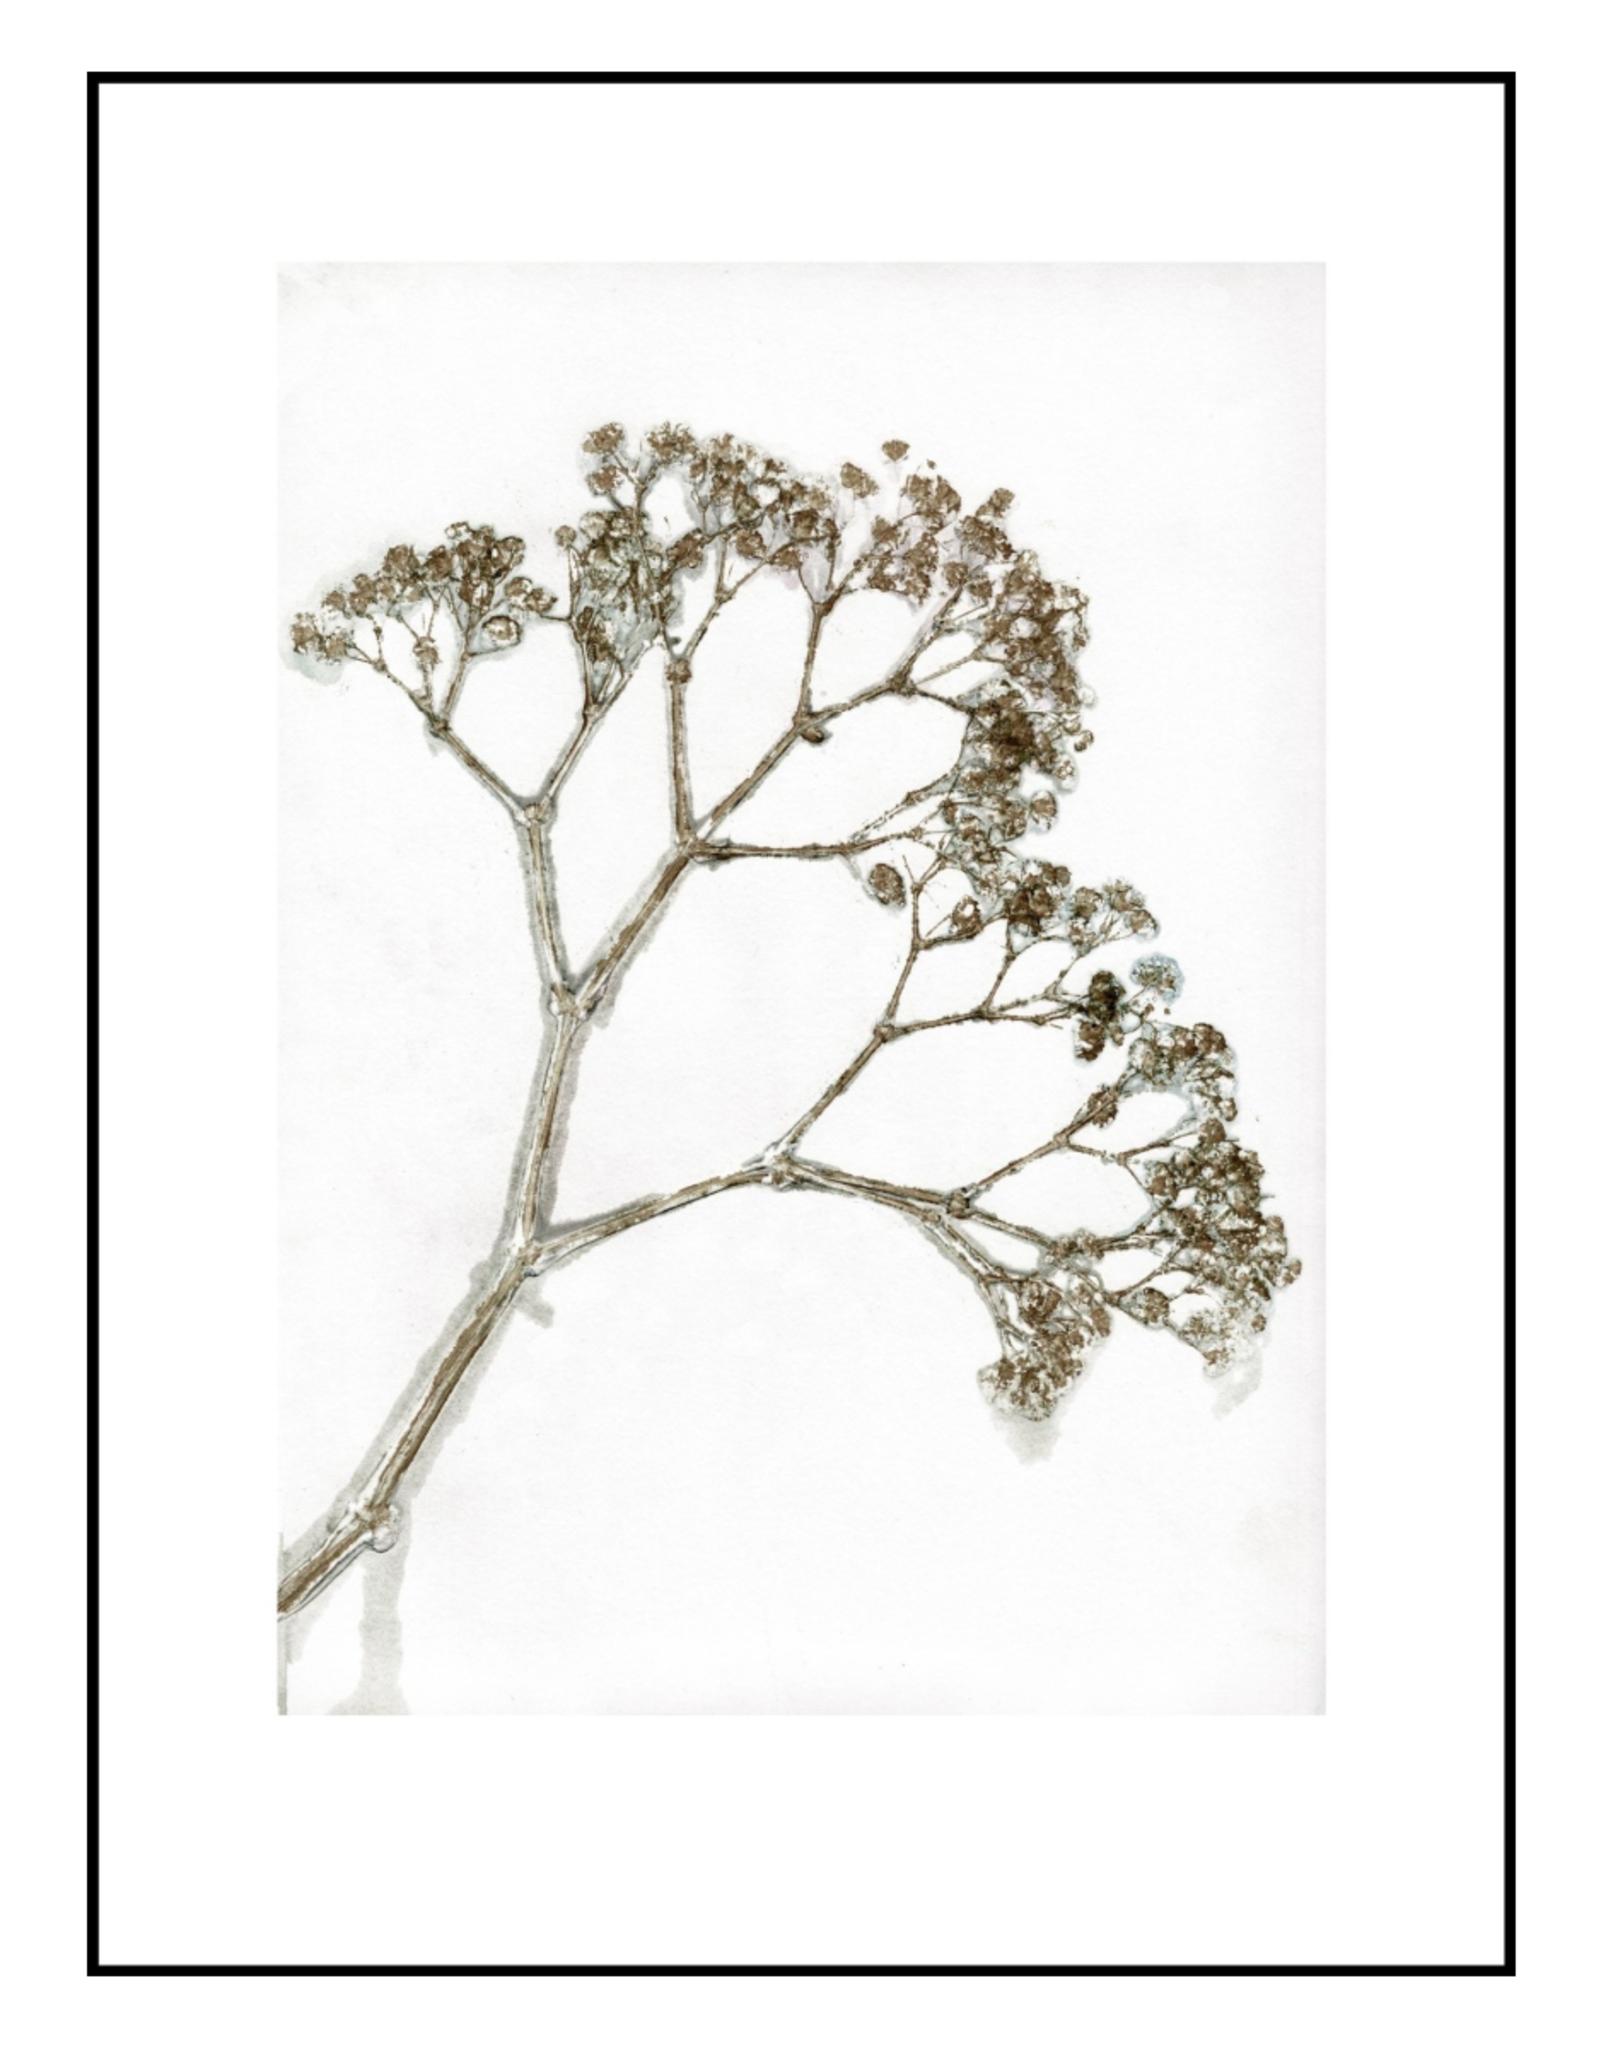 Pernille Folcarelli 'Gypso' khaki 30 x 40cm